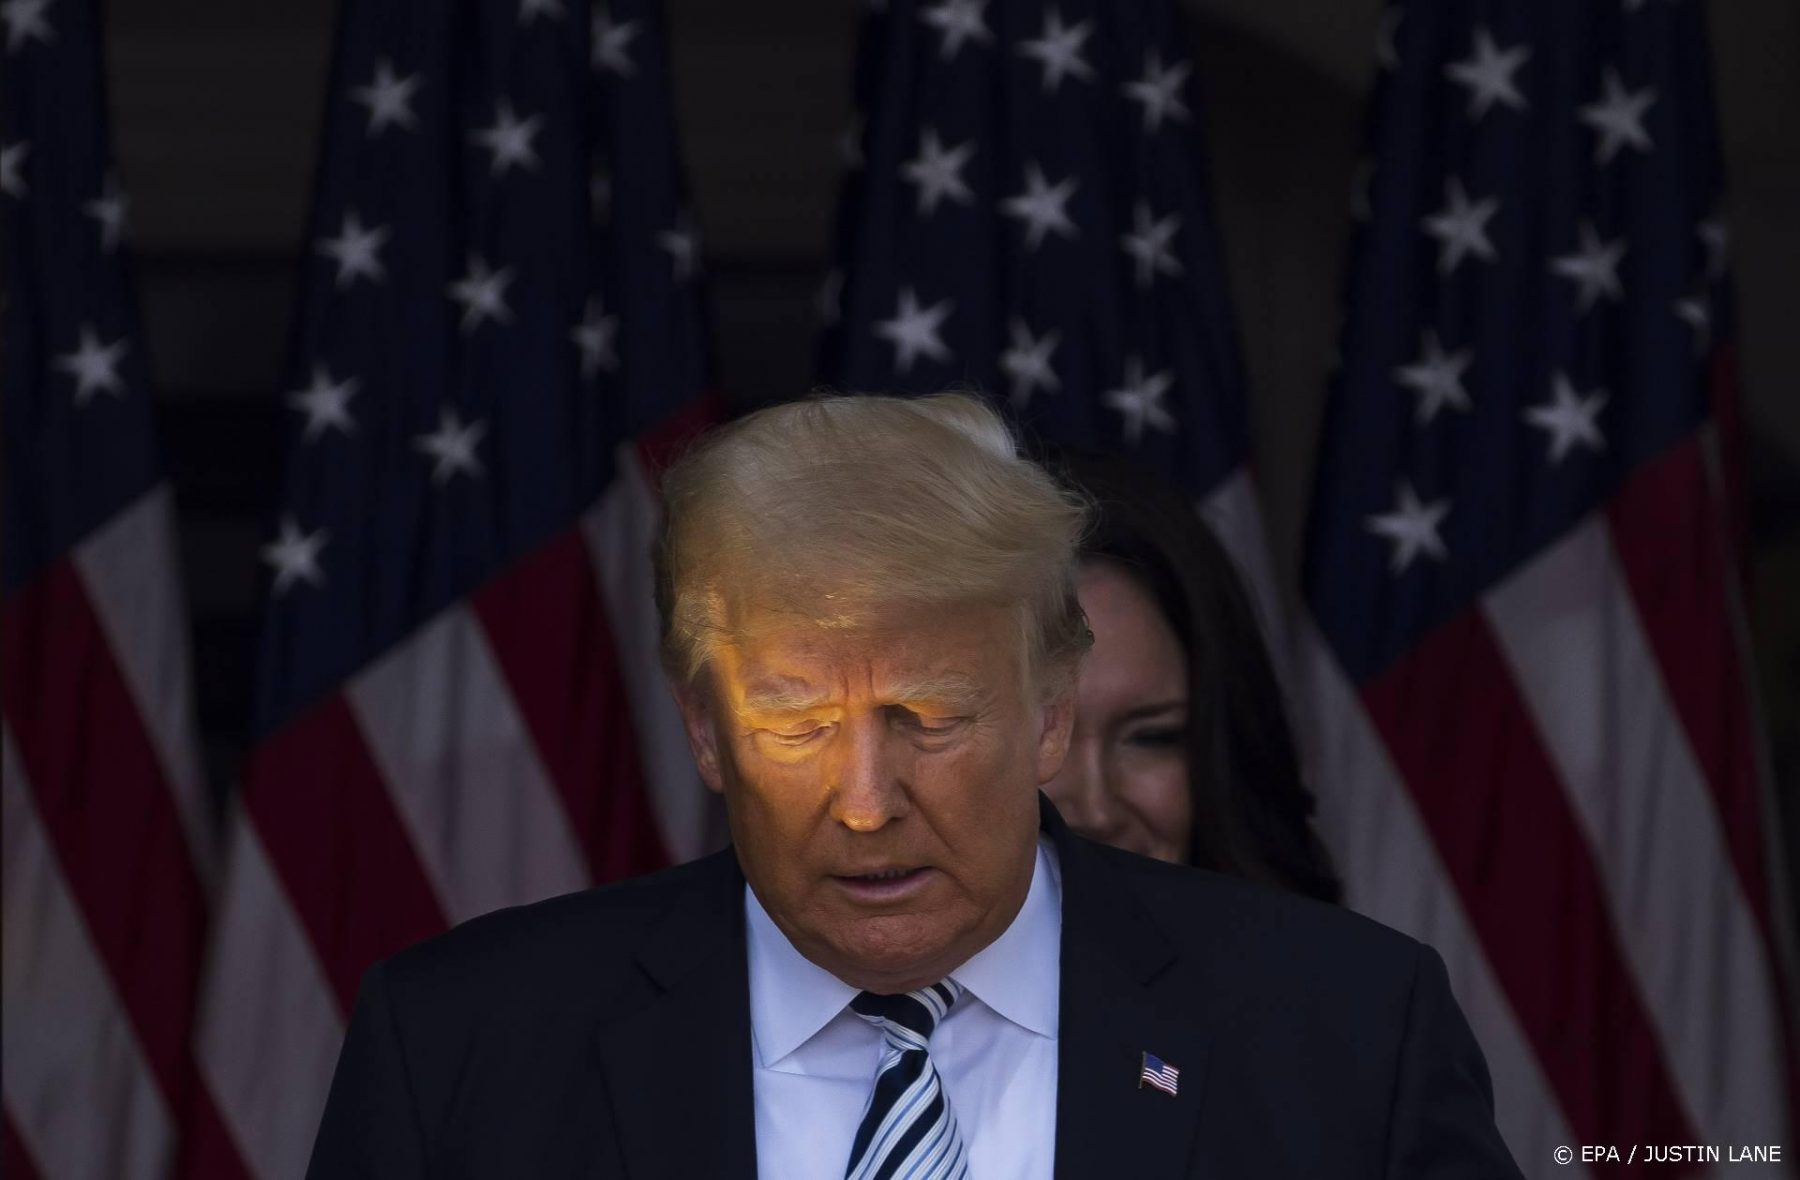 Donald Trump wilde presidentsverkiezingen frauduleus laten verklaren